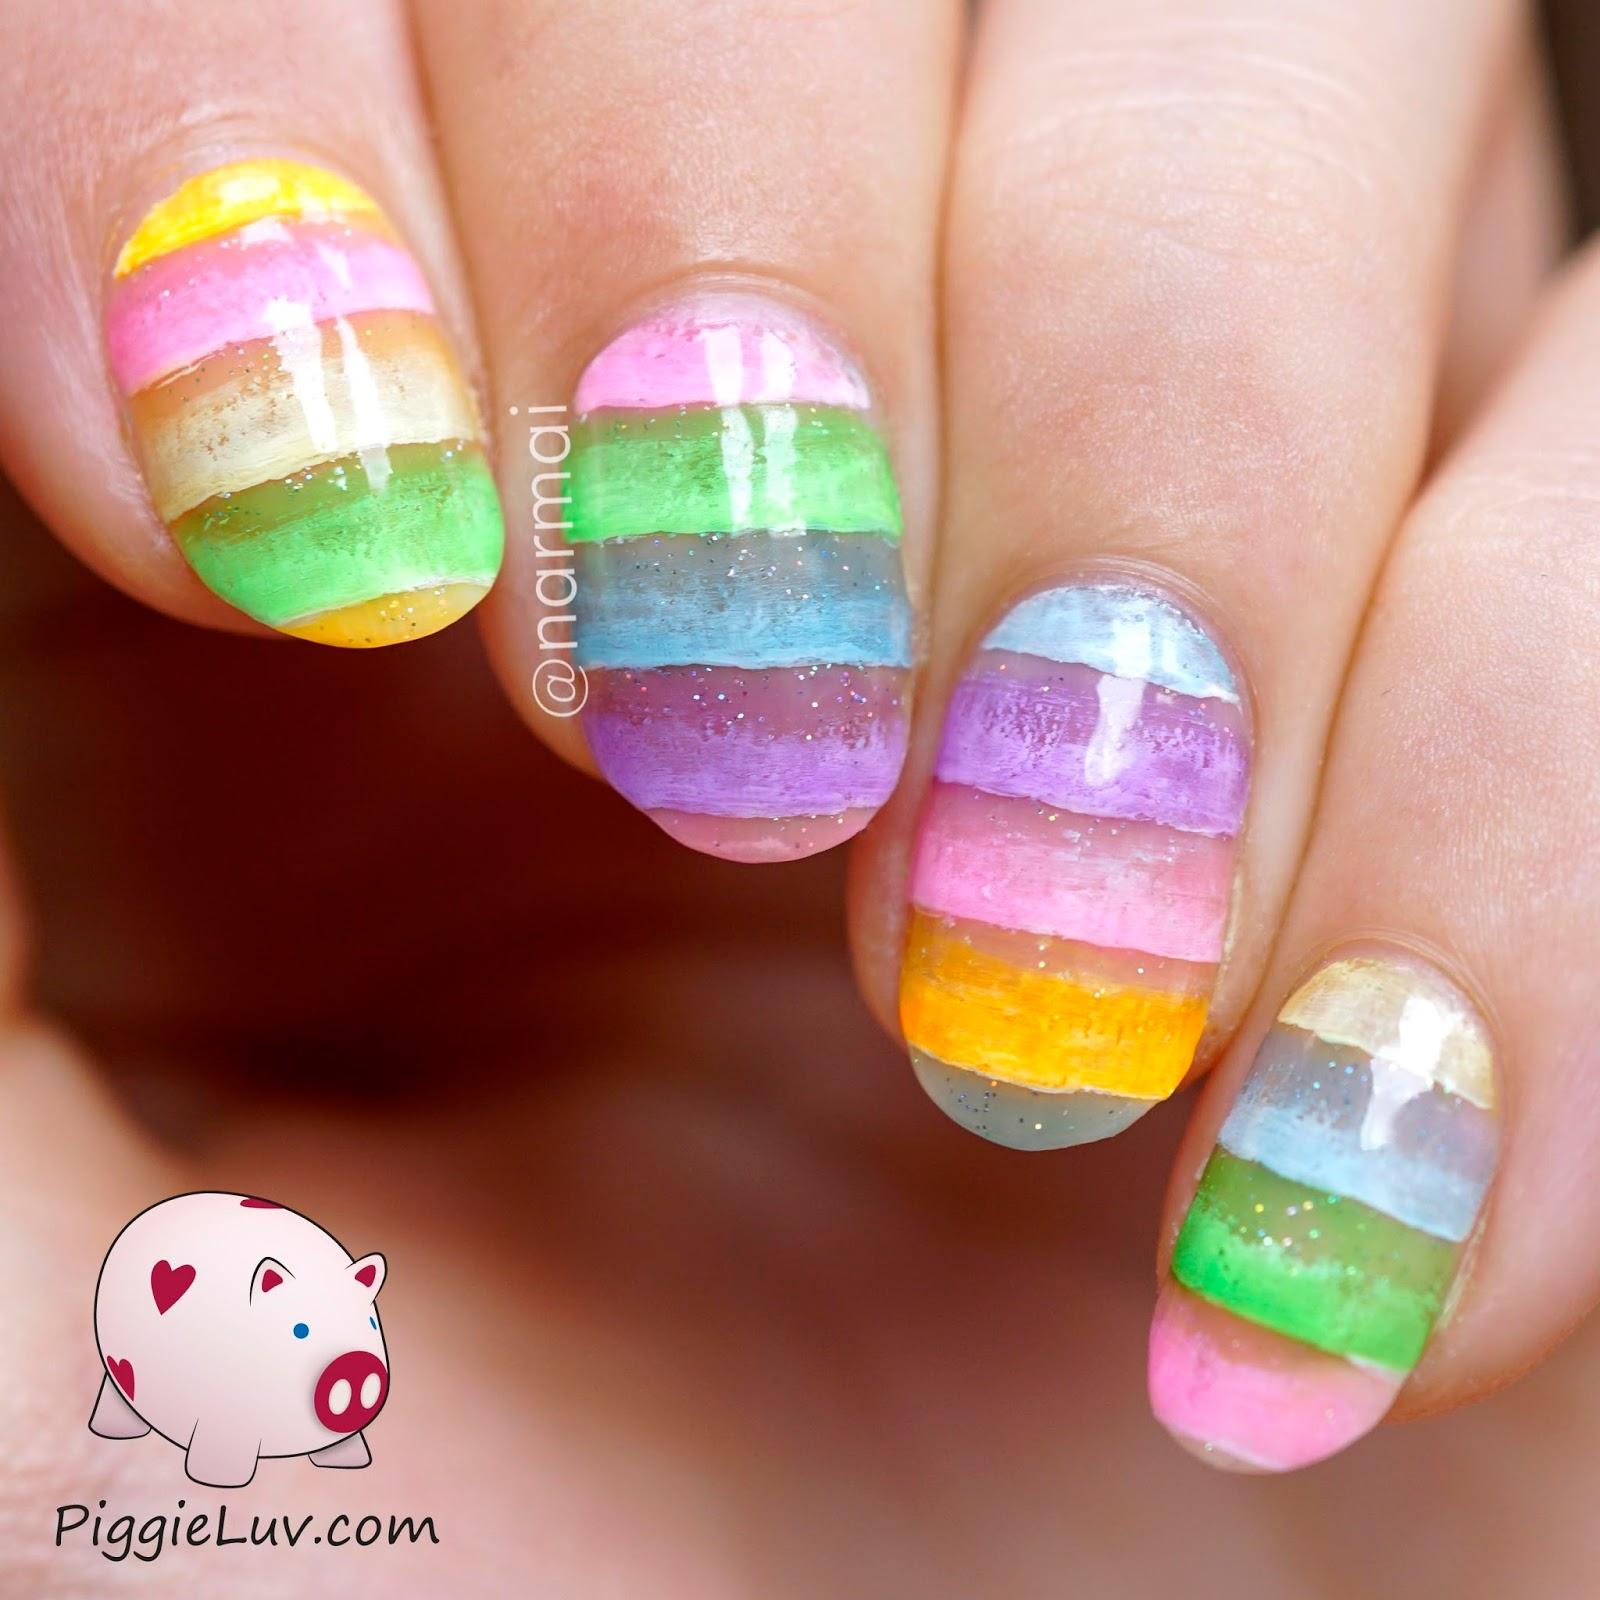 PiggieLuv: Jelly dessert nail art with OPI sheer tints